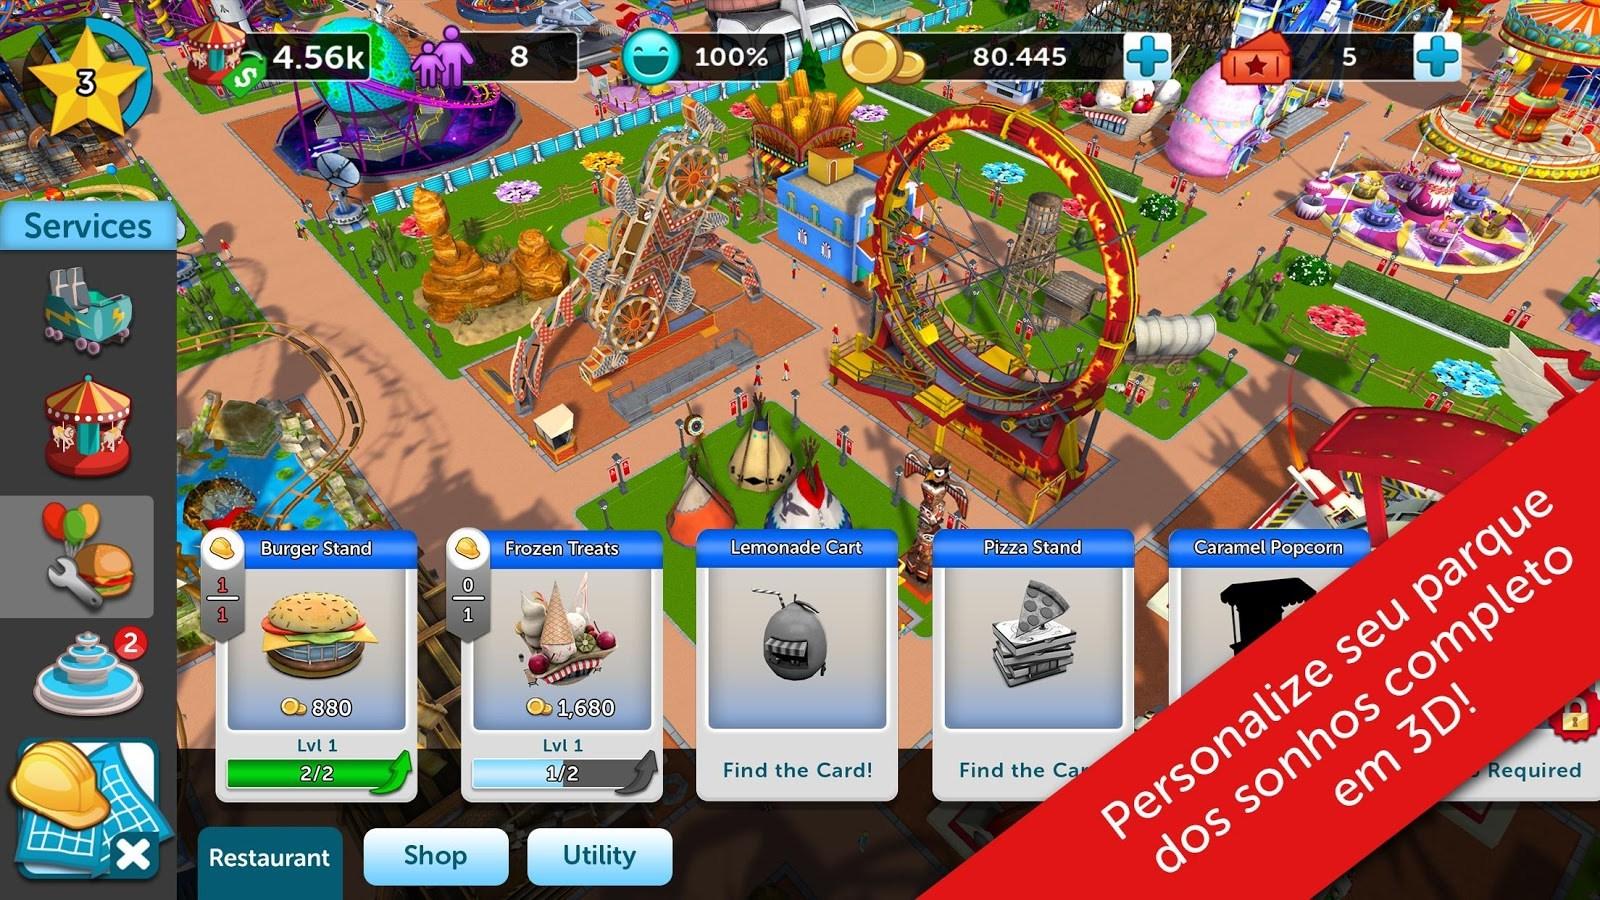 roller coaster tycoon 2 completo gratis baixaki